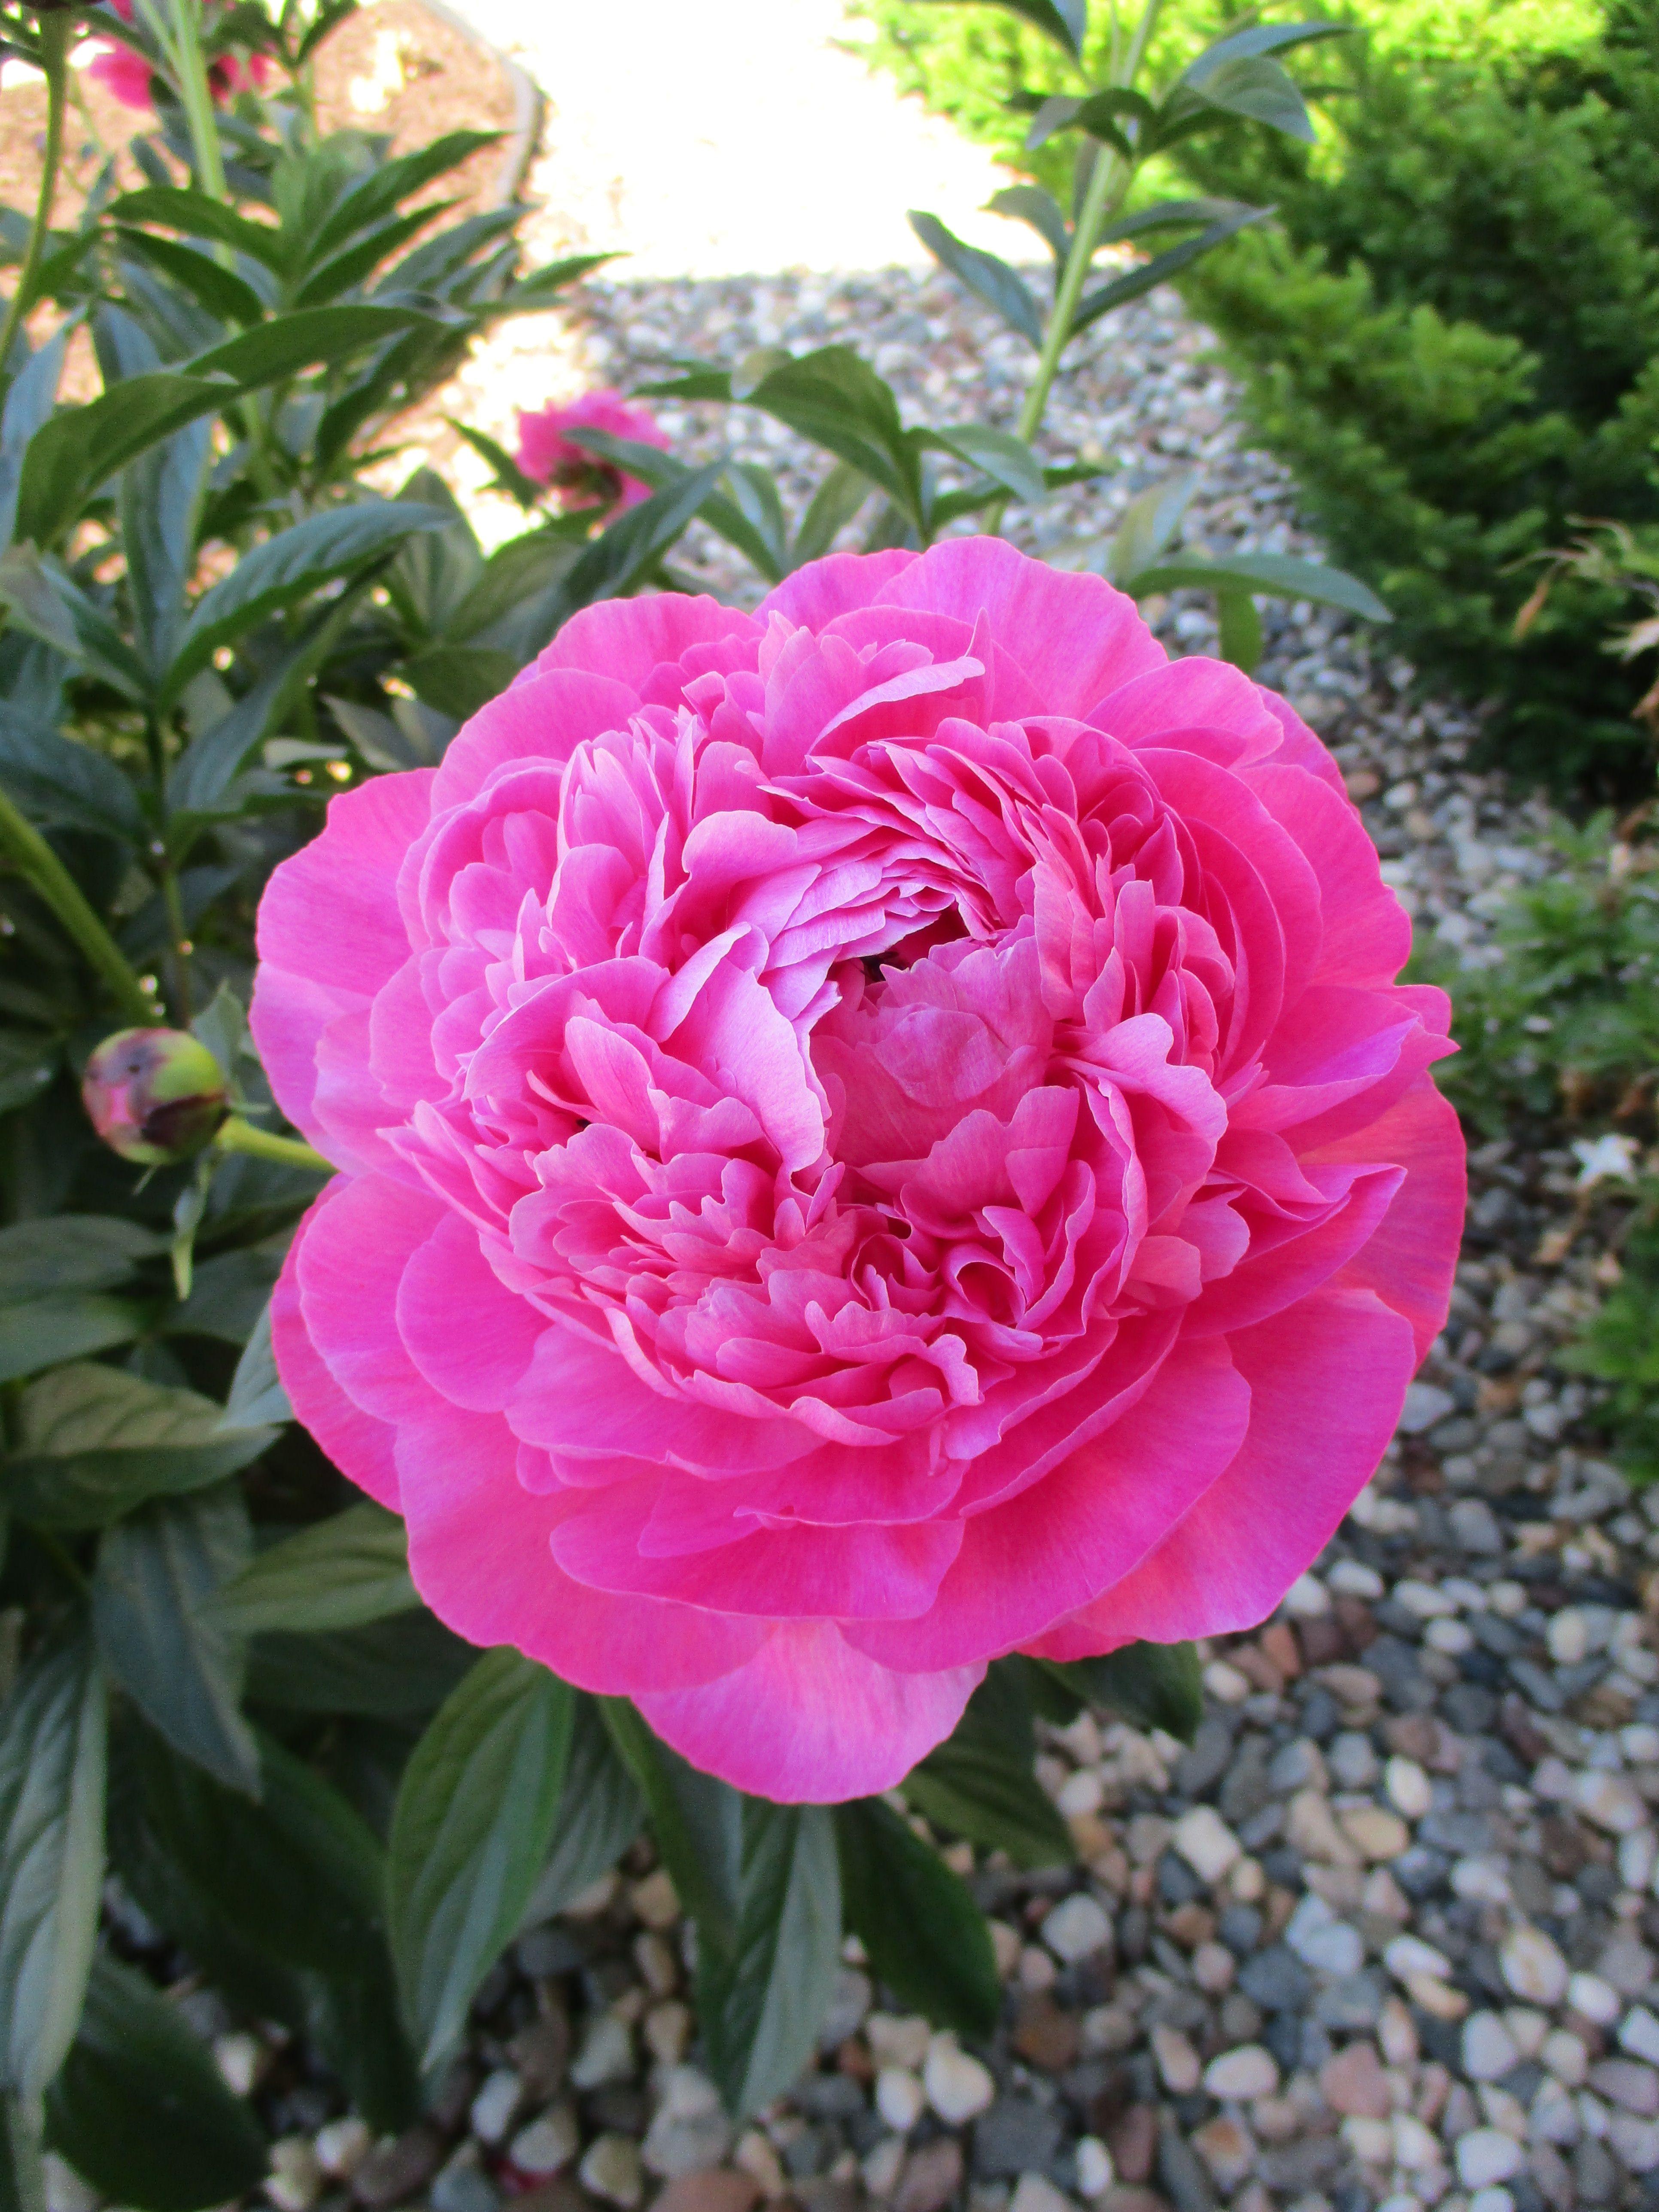 Pink peonie in our yard, June 2019 Flowers, Plants, Flora